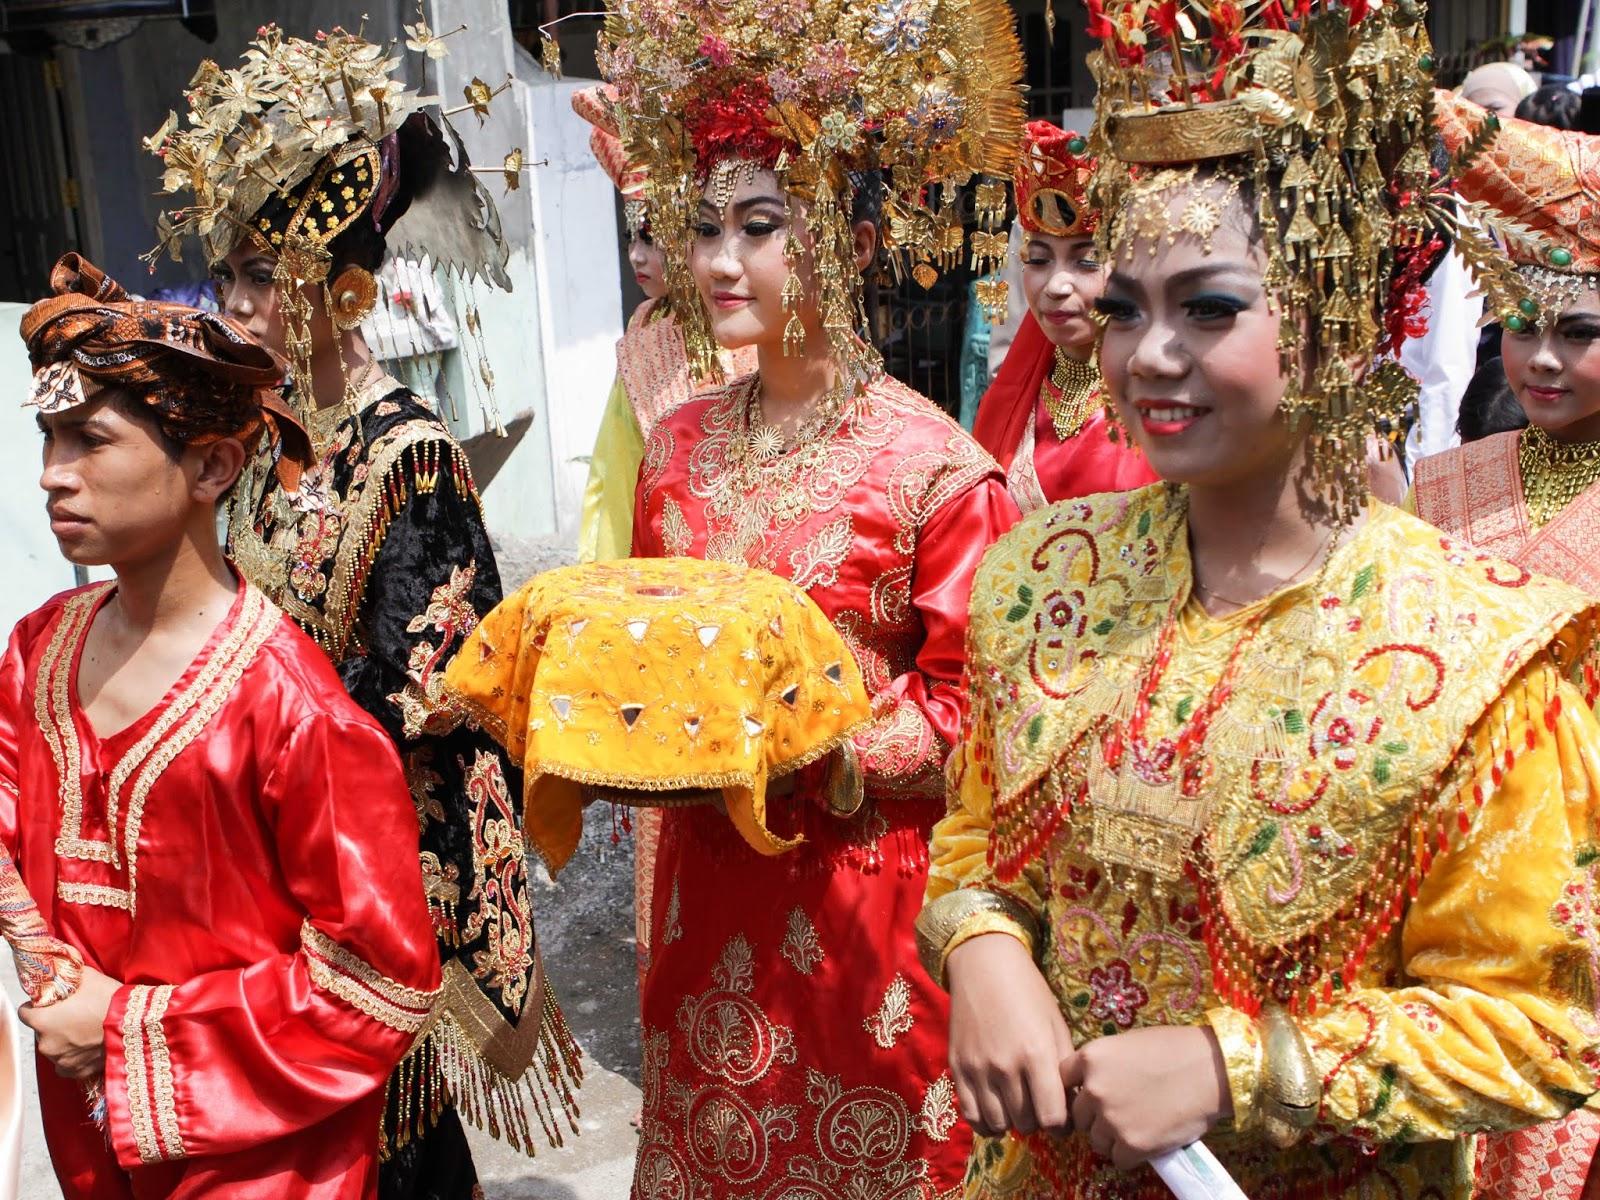 Baralek Gadang, Tradisi Pernikahan Adat Minang - JurnaLand